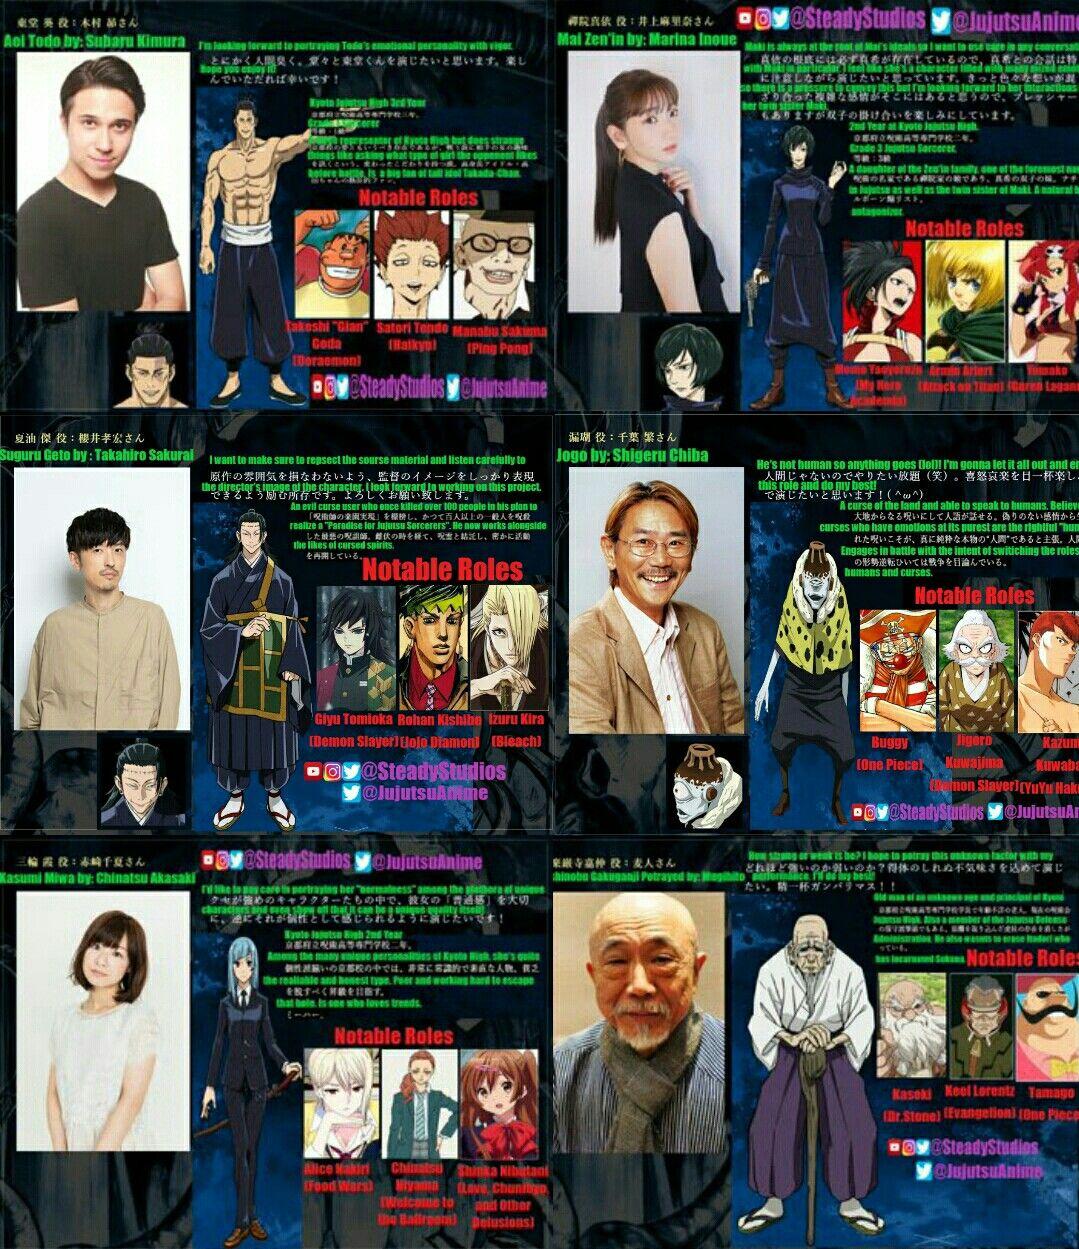 Jujutsu Kaisen 2nd Cour Additional Va Cast Animw Tv Seiyuu Kyoto Jujutsu High Voice Cast Revealed So Far In 2021 Animation Film Popular Tv Series Jujutsu